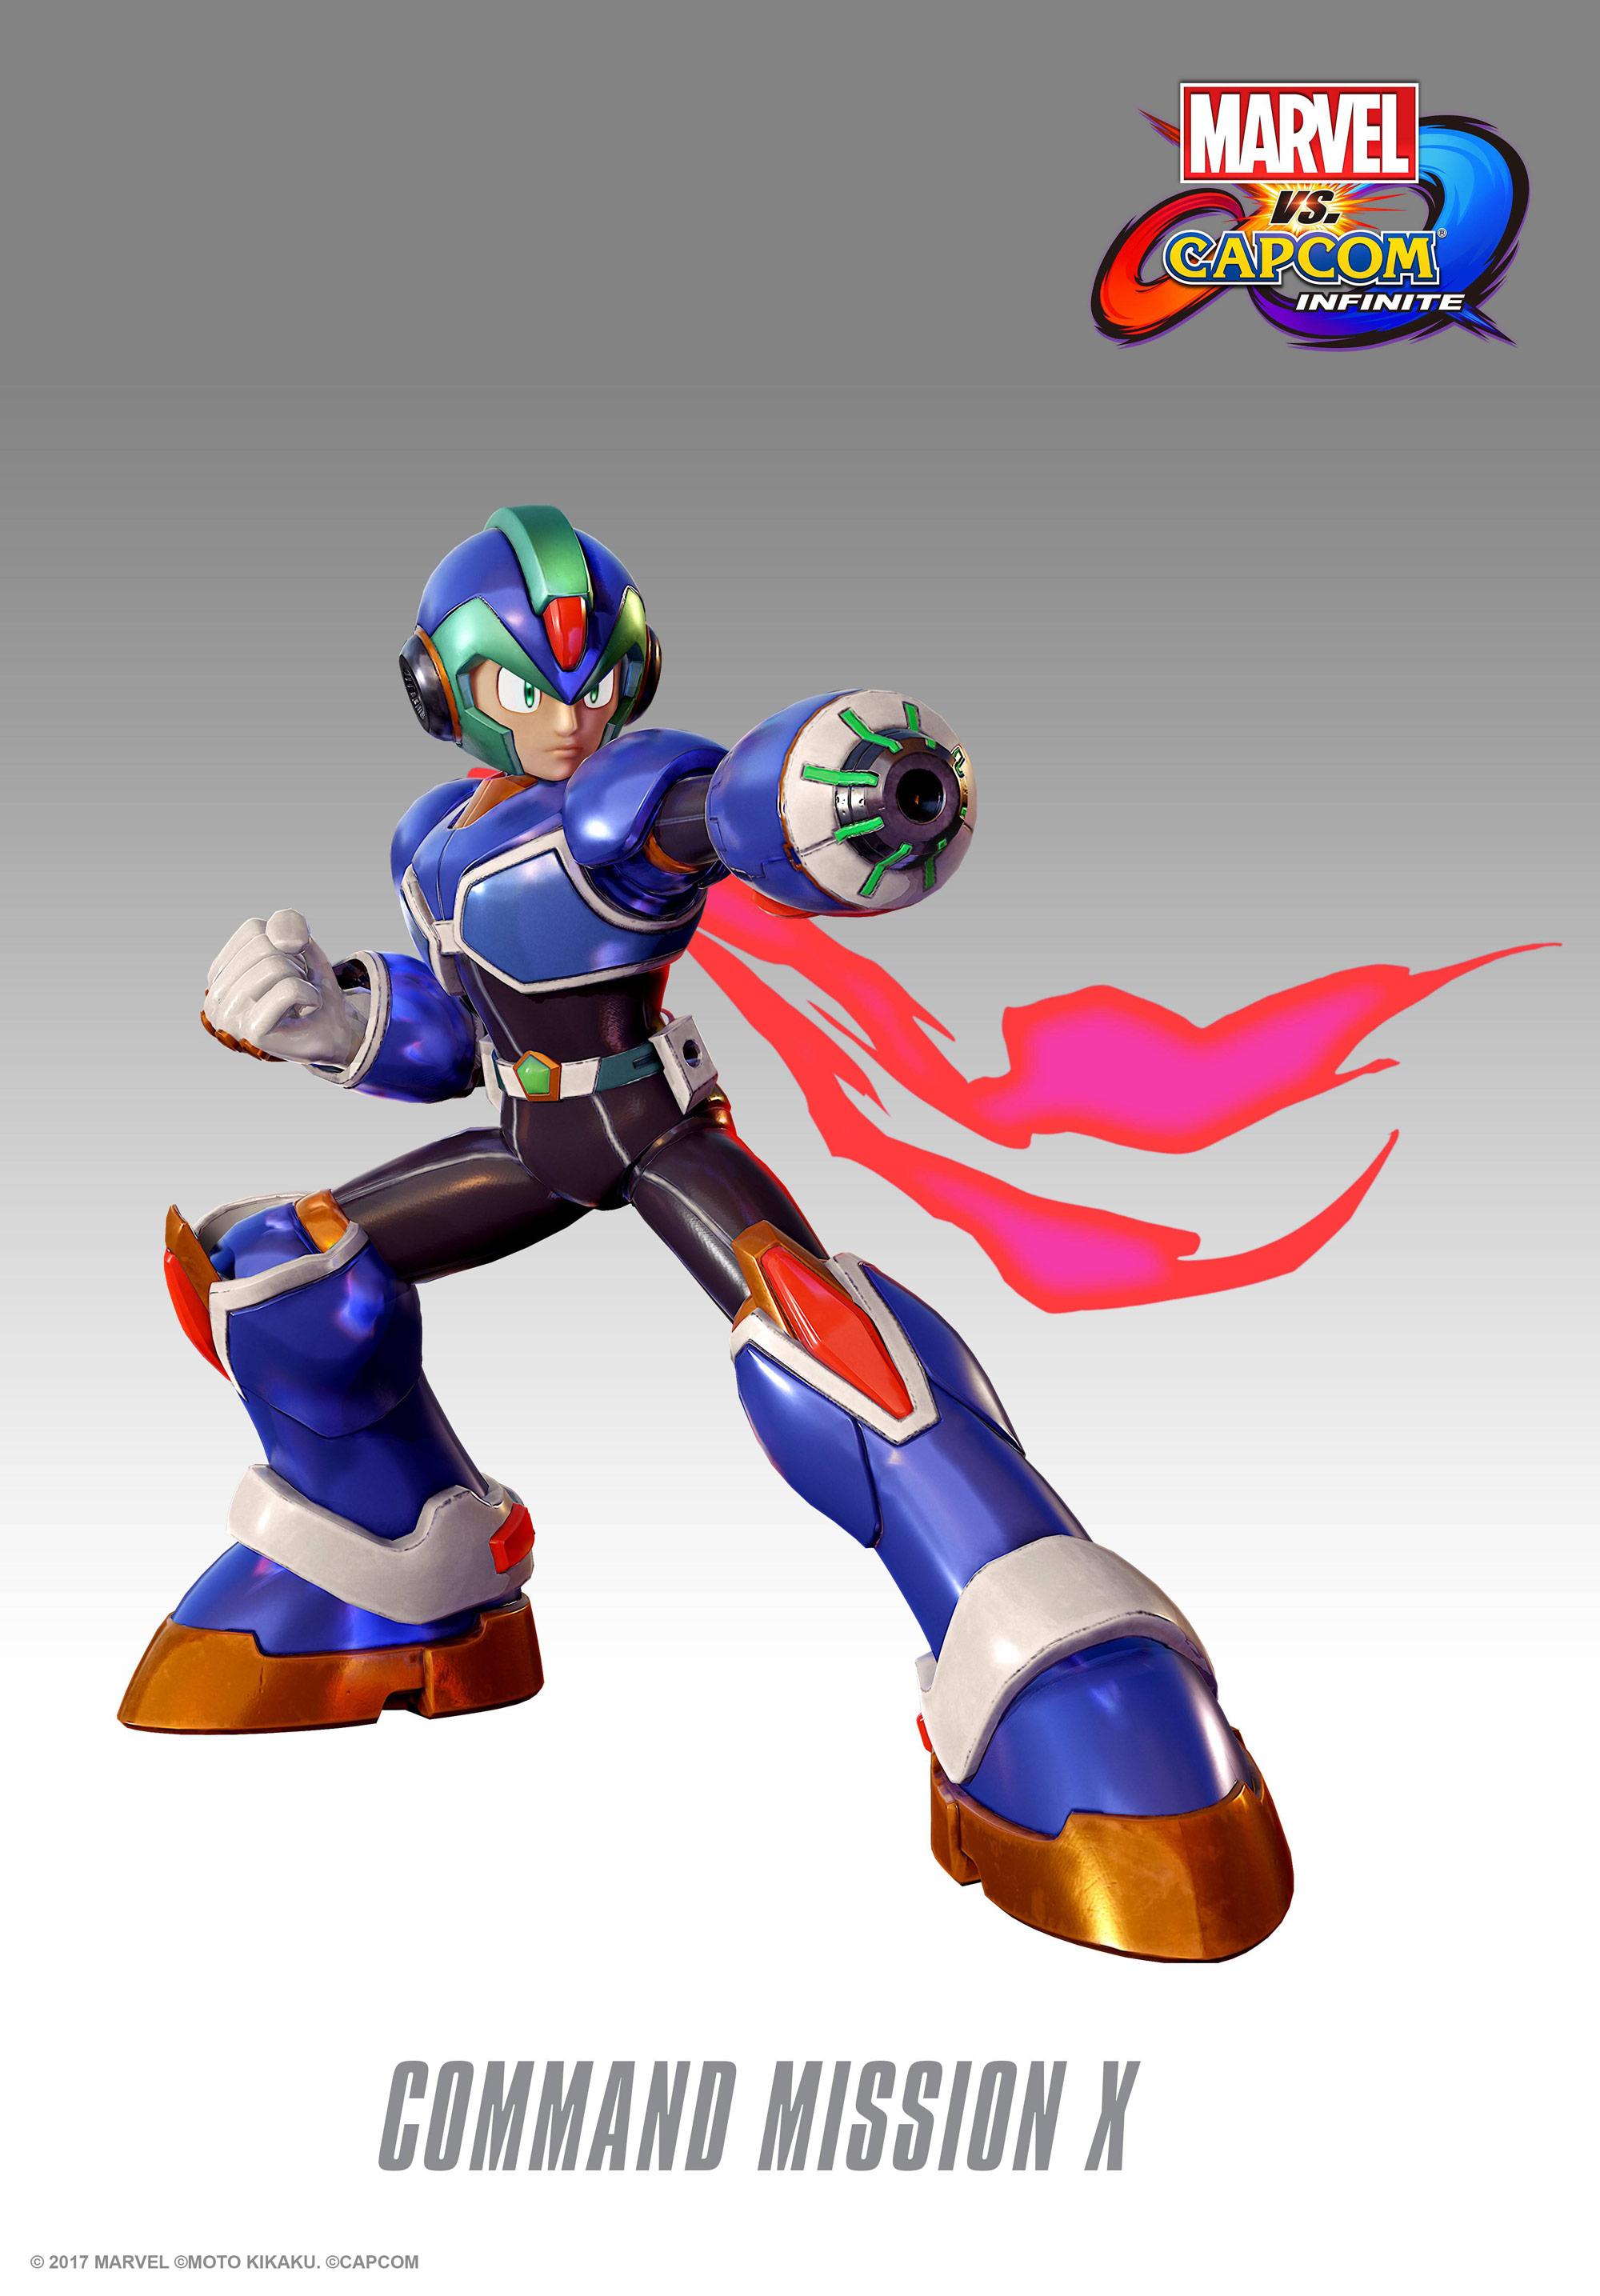 Marvel vs. Capcom: Infinite premium costumes for Mega Man, Ryu, Thor and Hulk 1 out of 4 image gallery